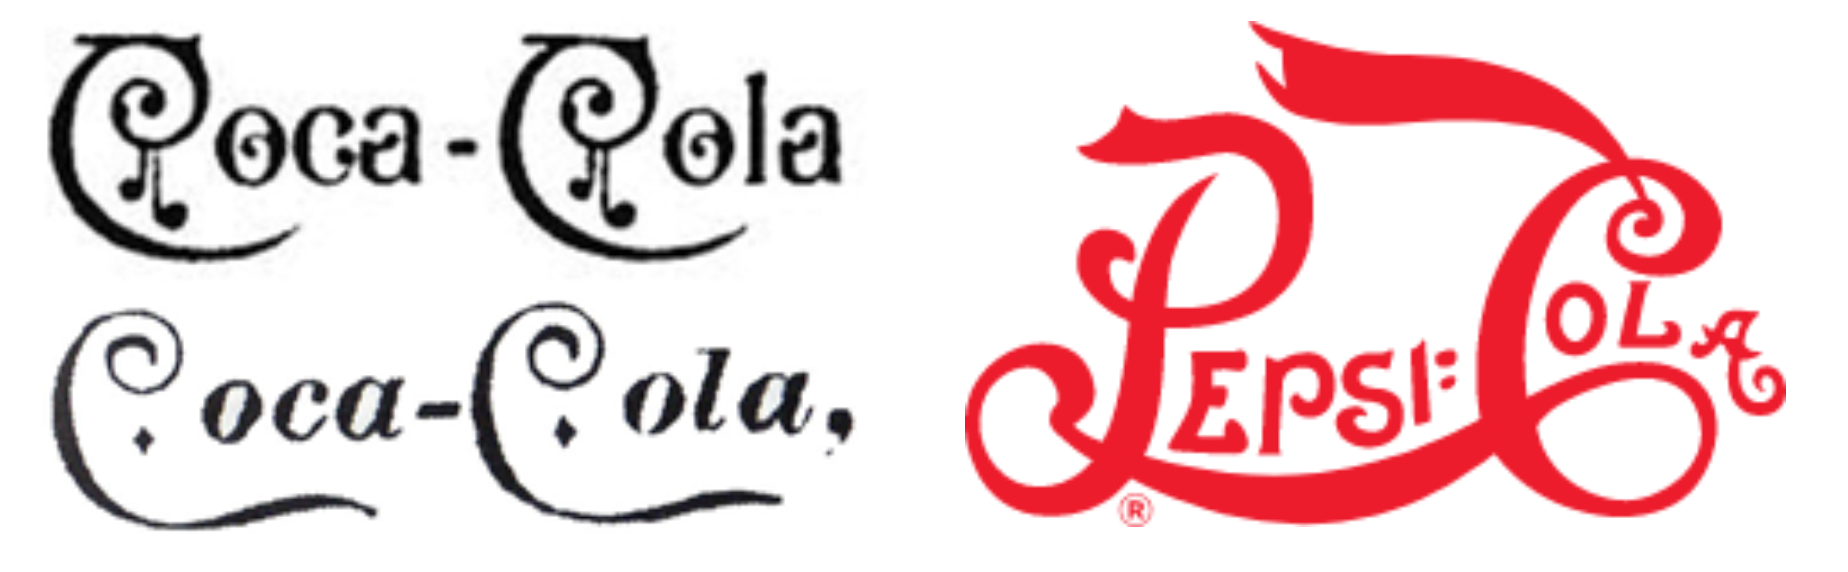 Coca-cola and Pepsi logos in 1895-1905